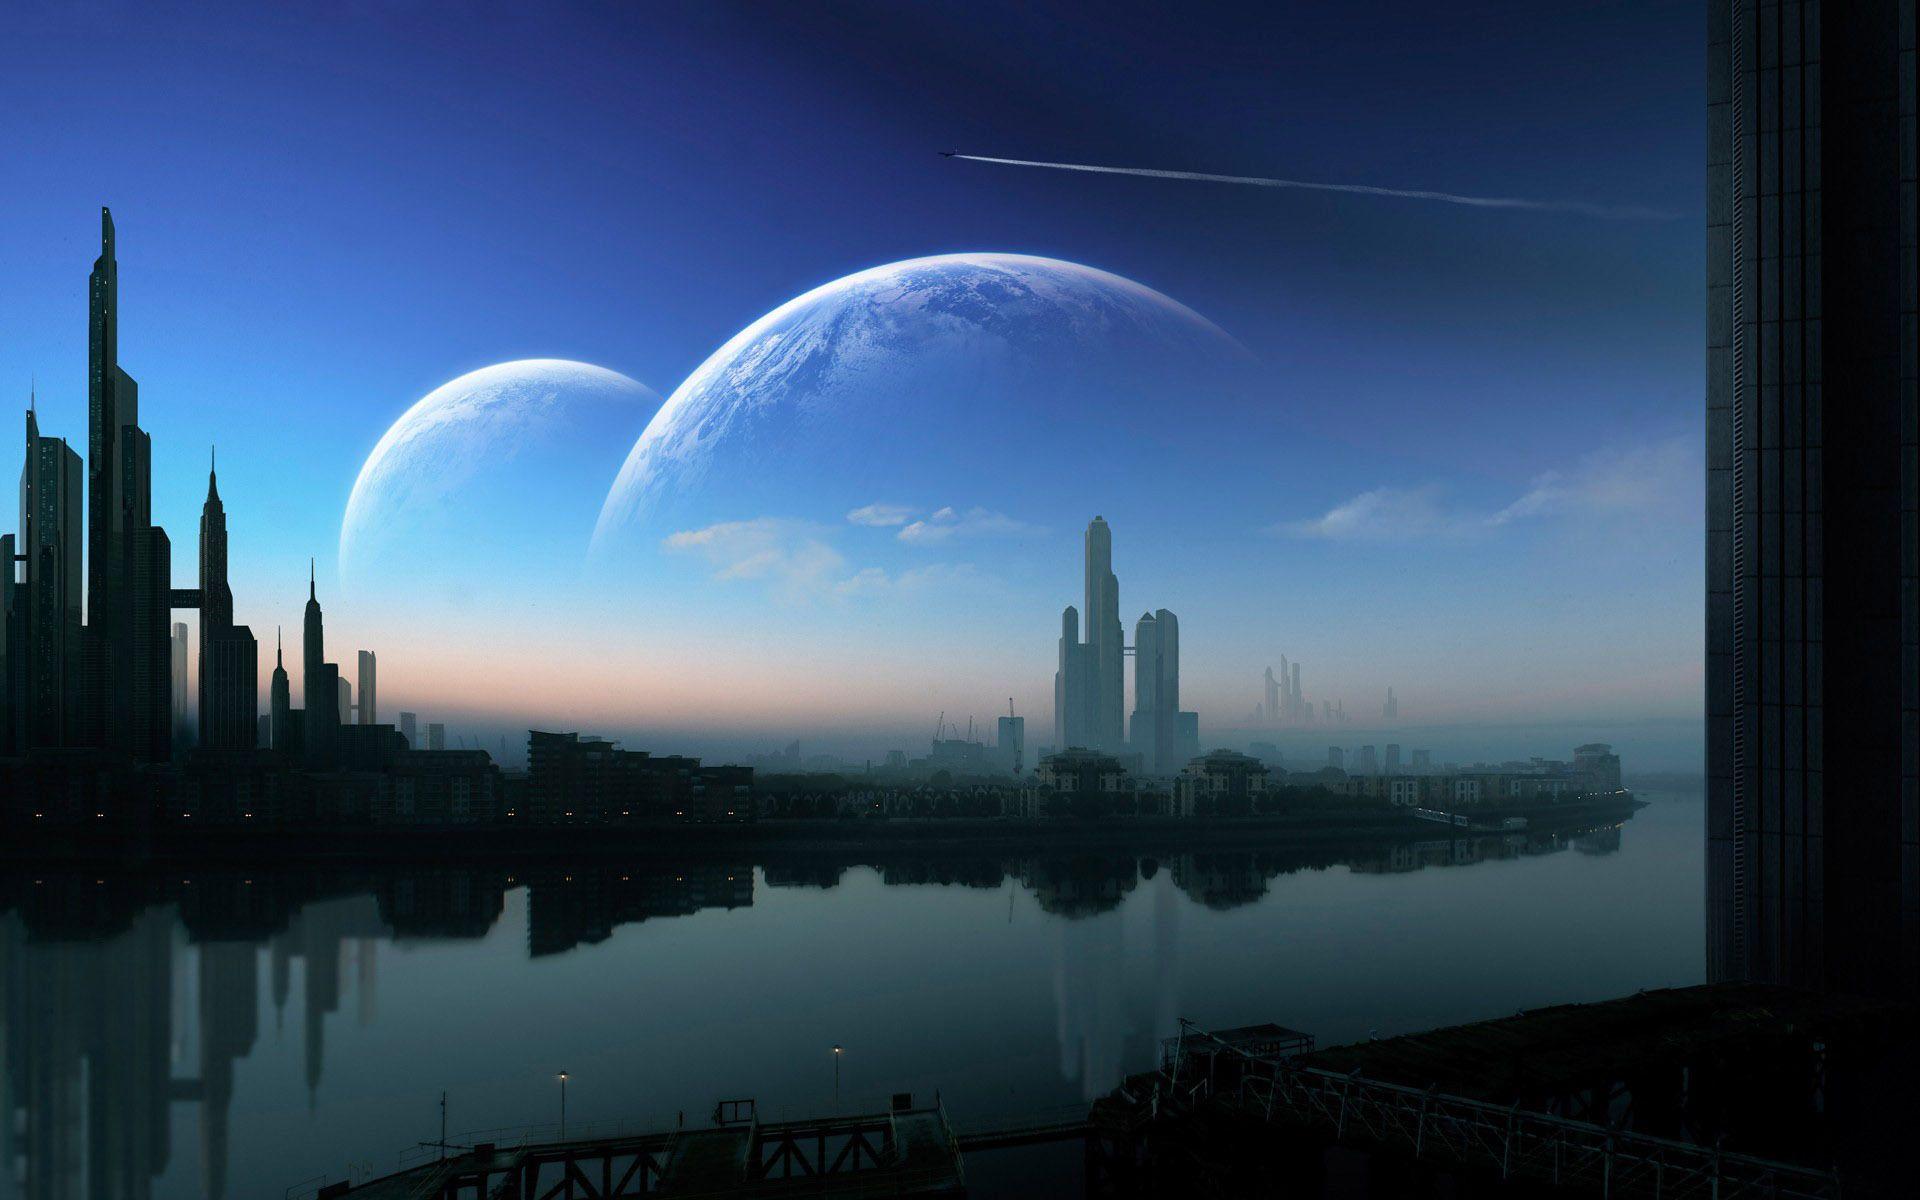 Futuristic Cities Wallpaper